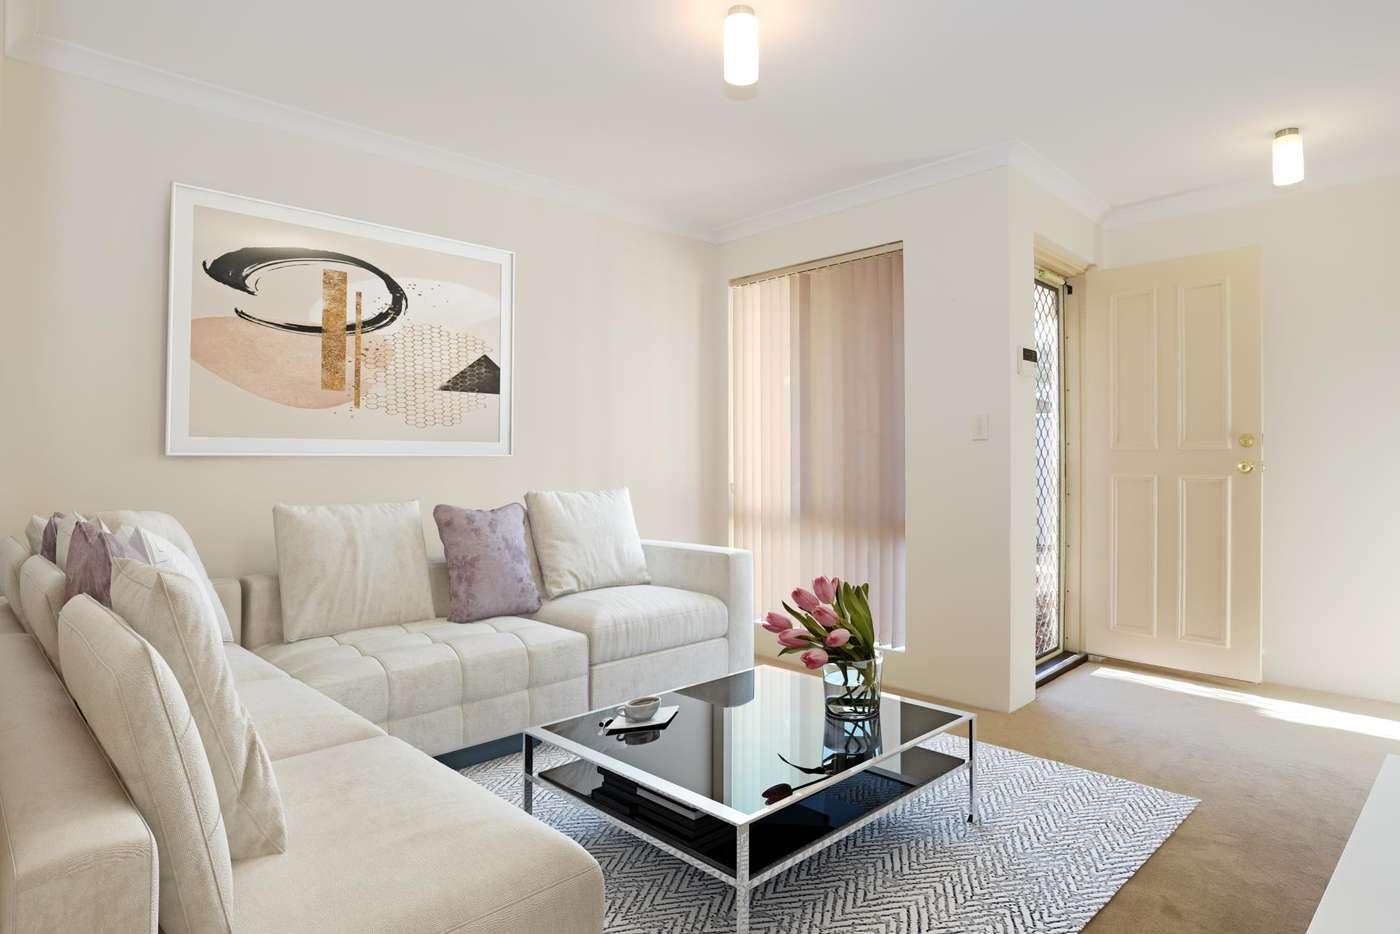 Main view of Homely villa listing, 4/19 Warwick  Street, St James WA 6102